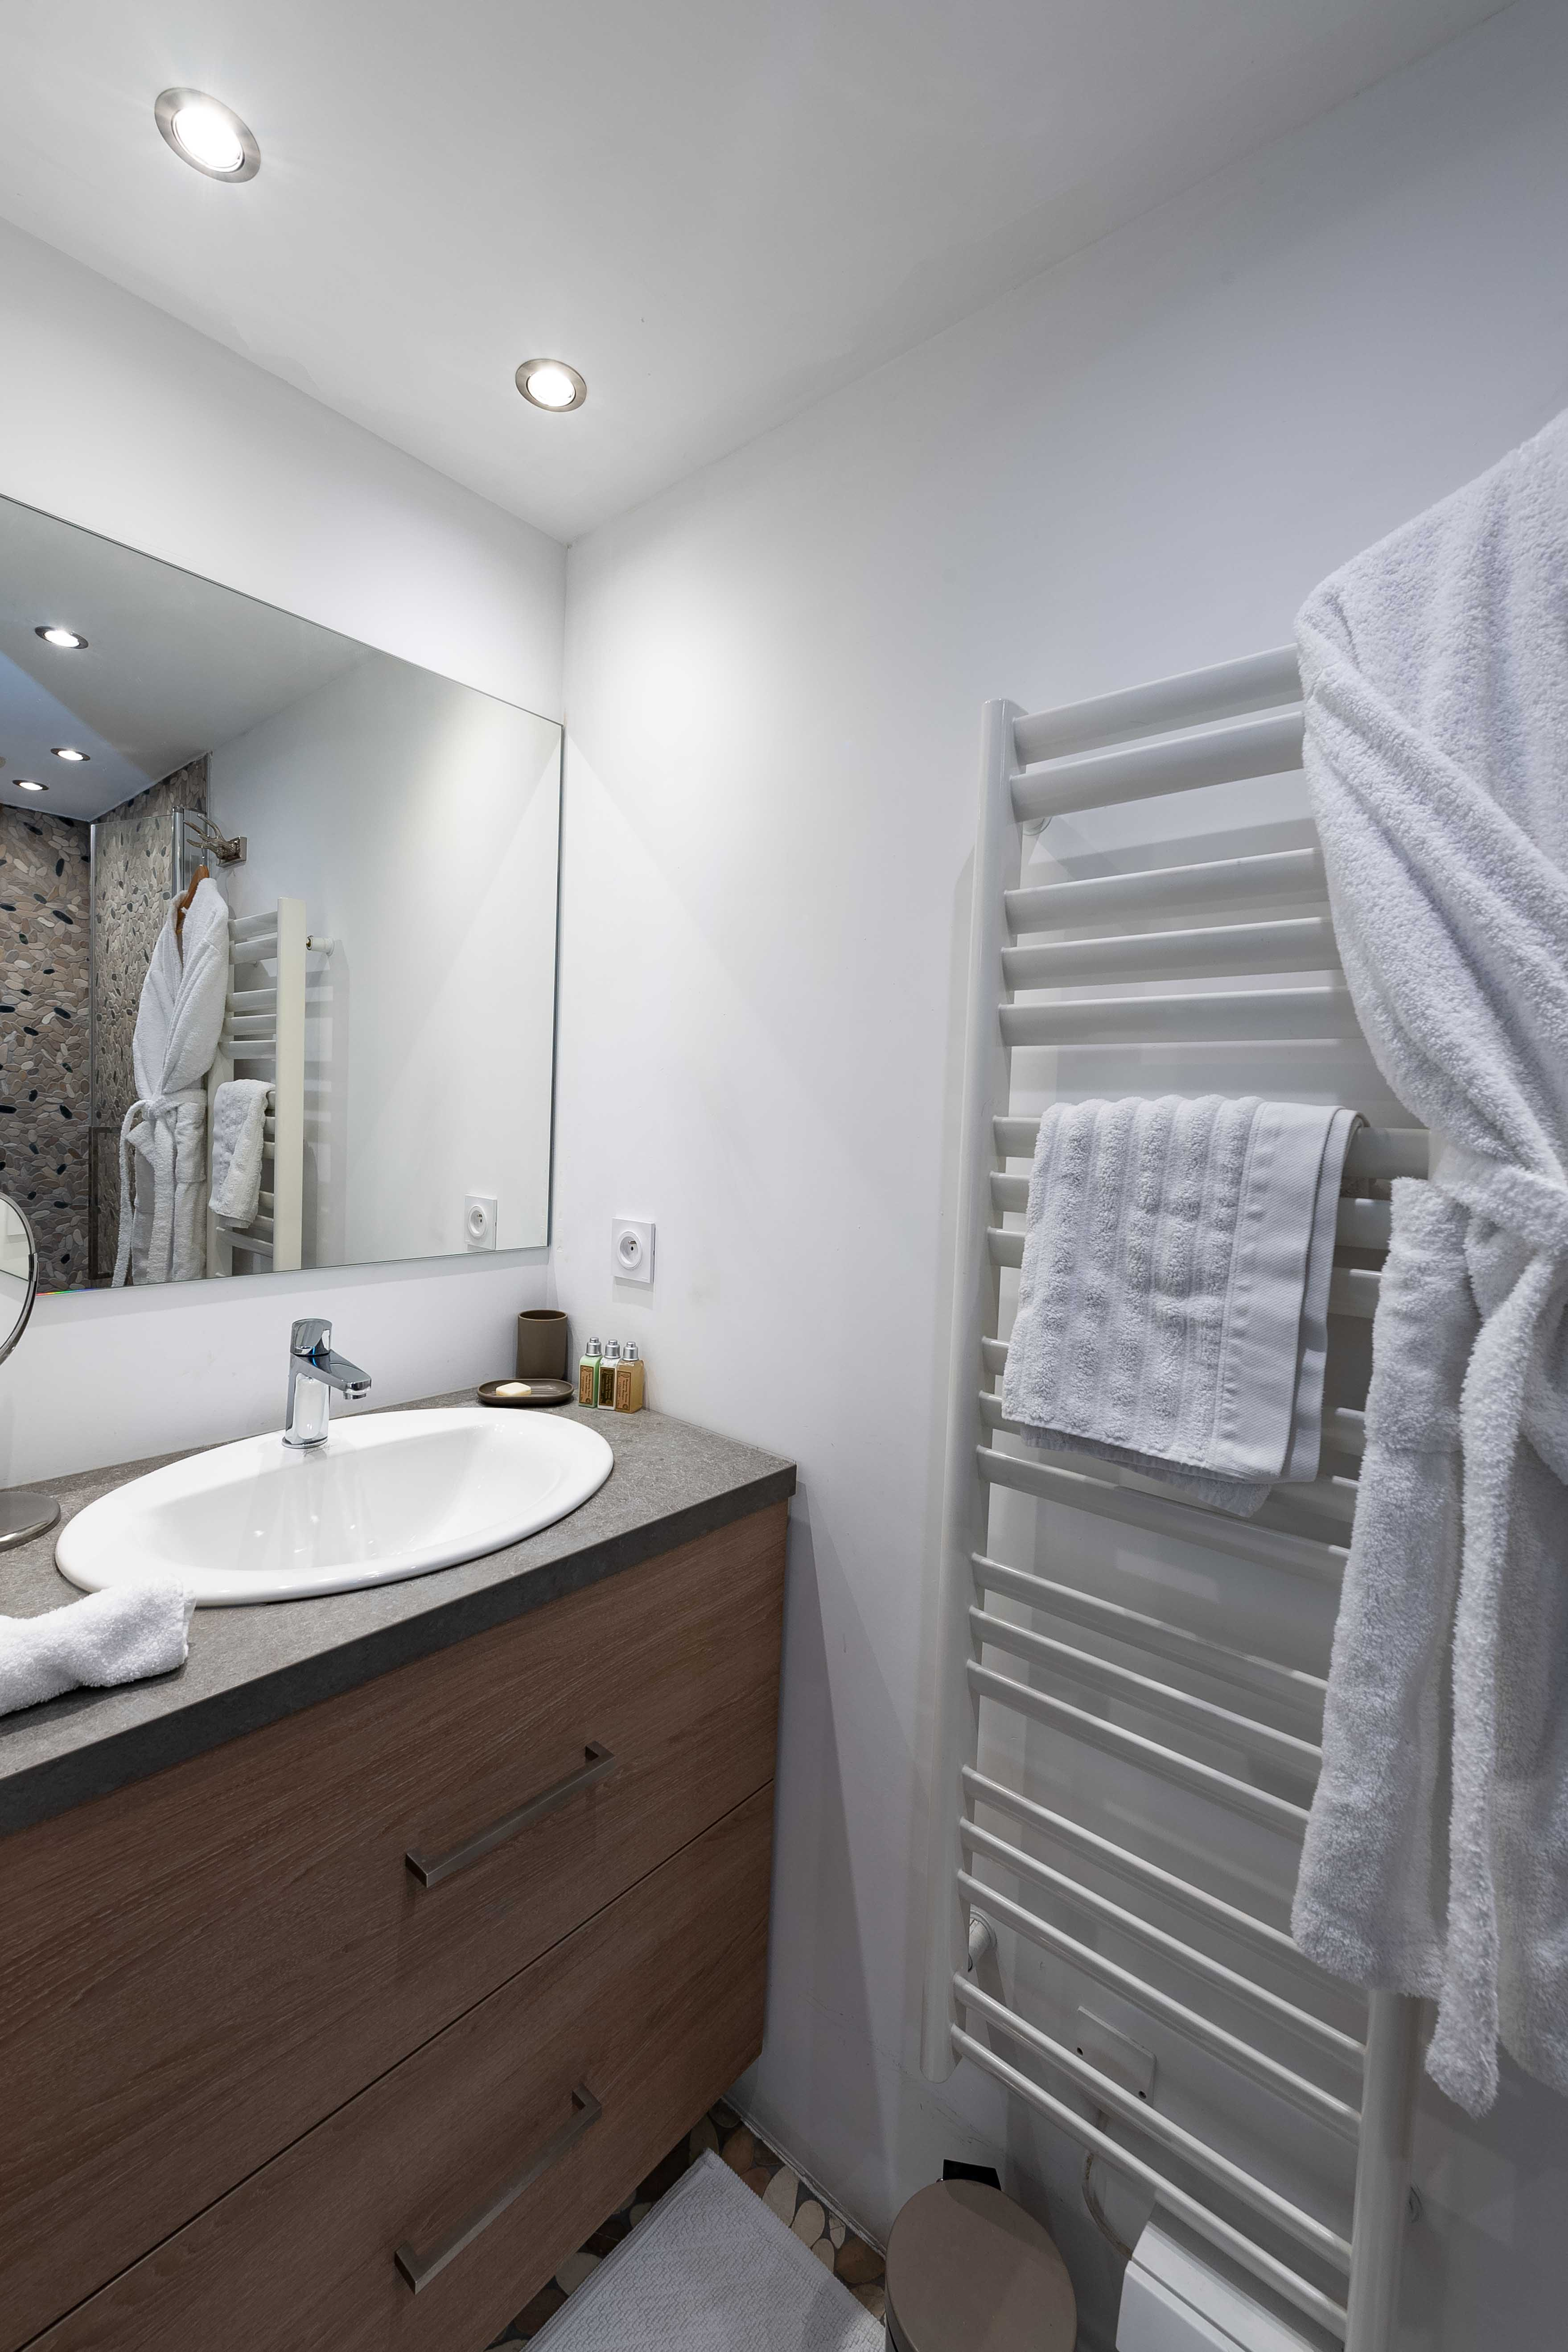 salle de bain appartement sylvain